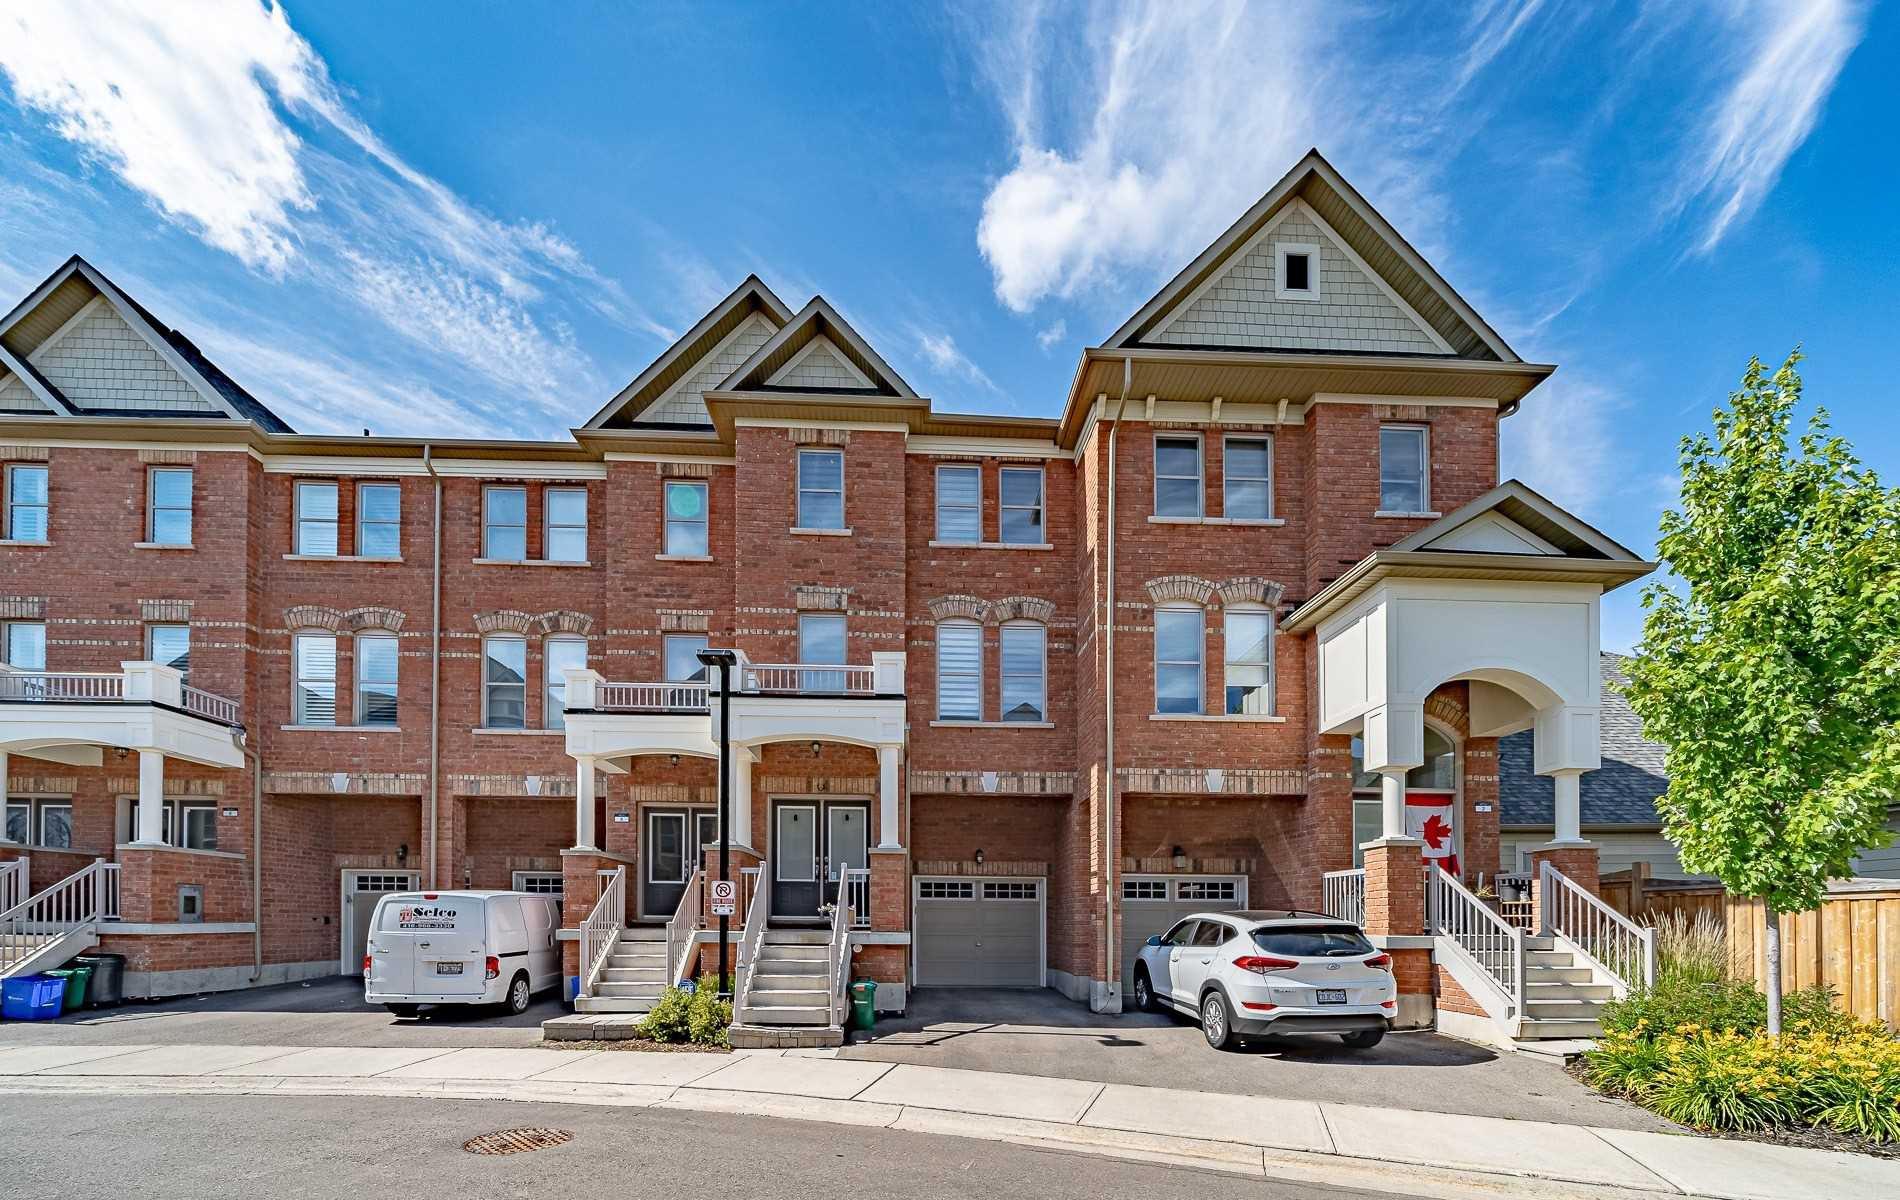 Main Photo: 4 City Park Circle in Vaughan: West Woodbridge House (3-Storey) for sale : MLS®# N4818940